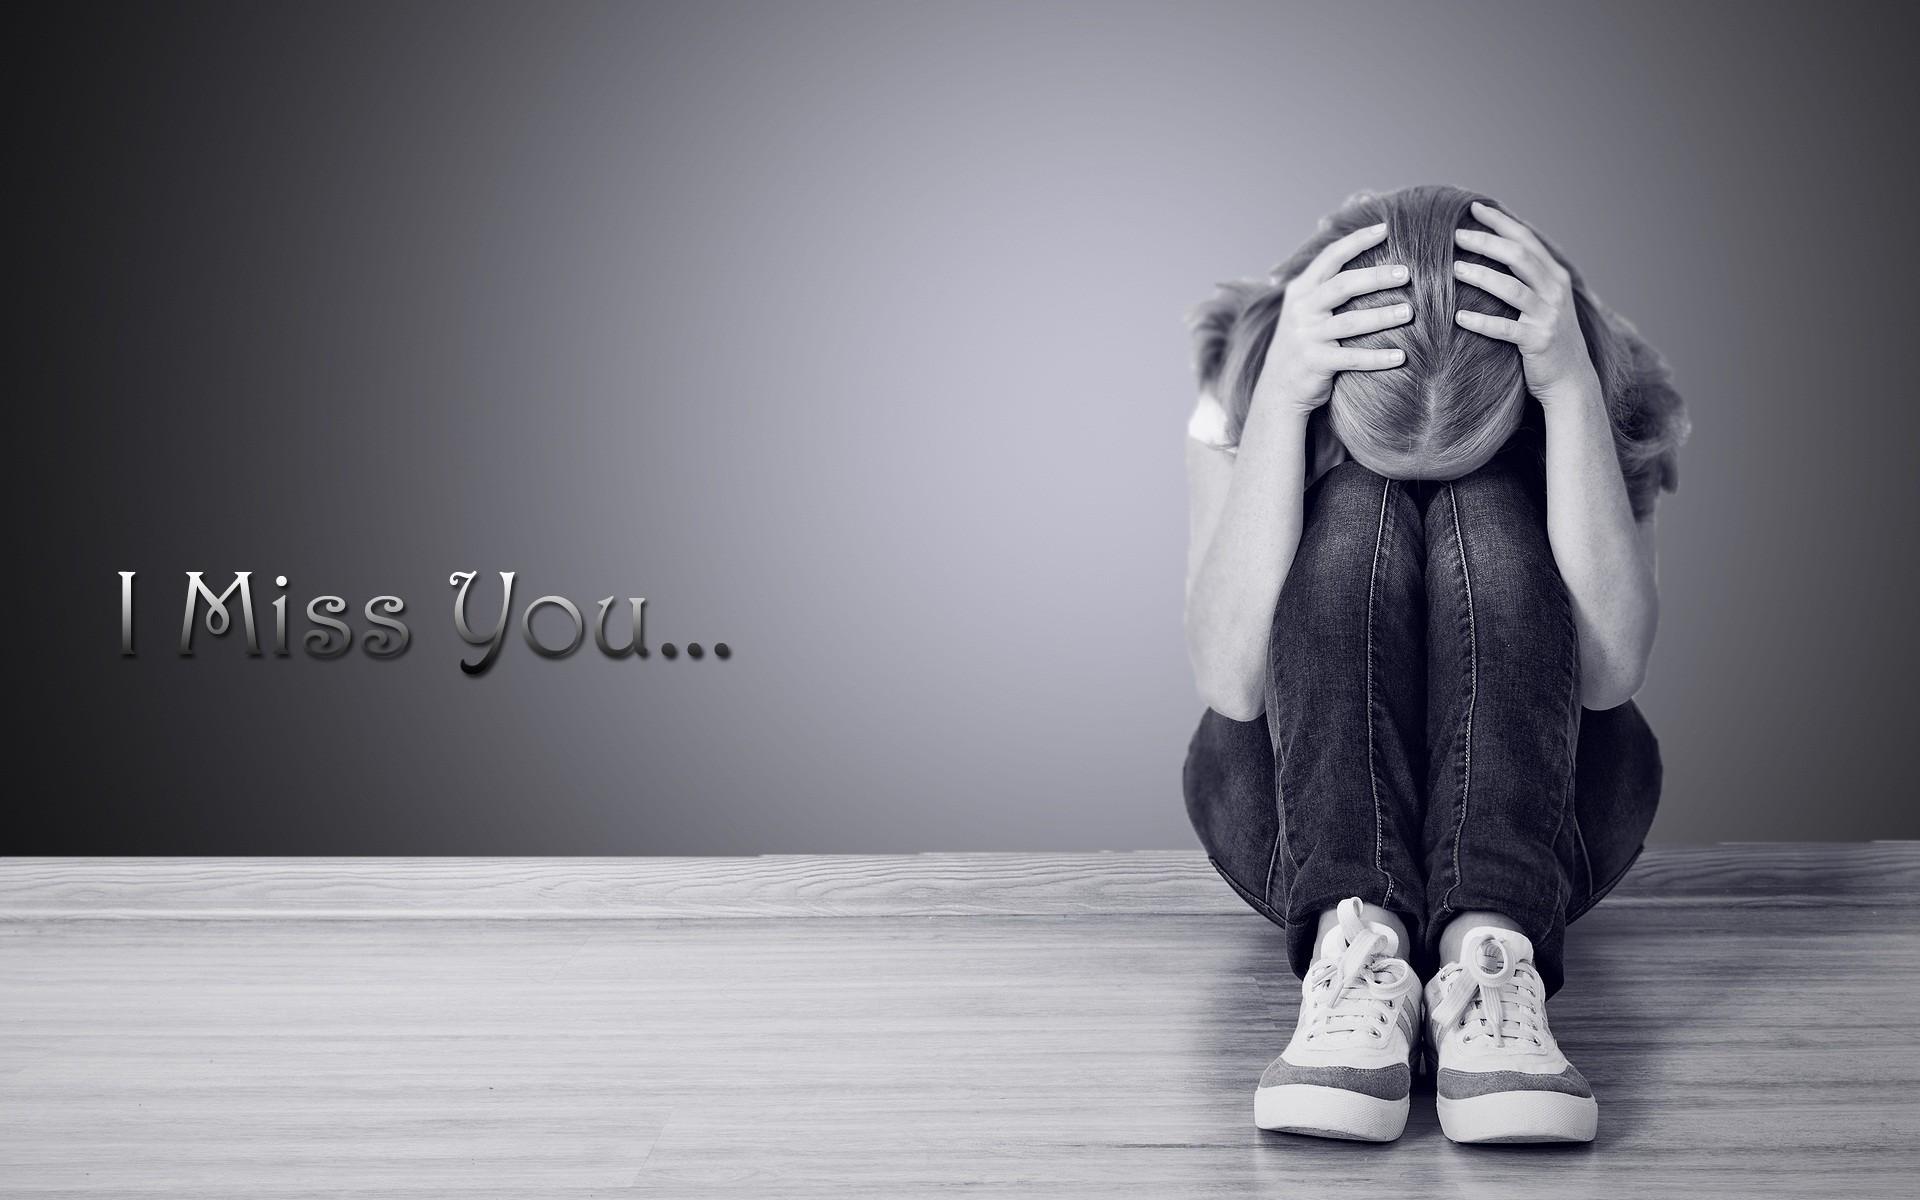 Sad Girl Full Hd Wallpaper Download Crying Wallpapers 183 ① Wallpapertag